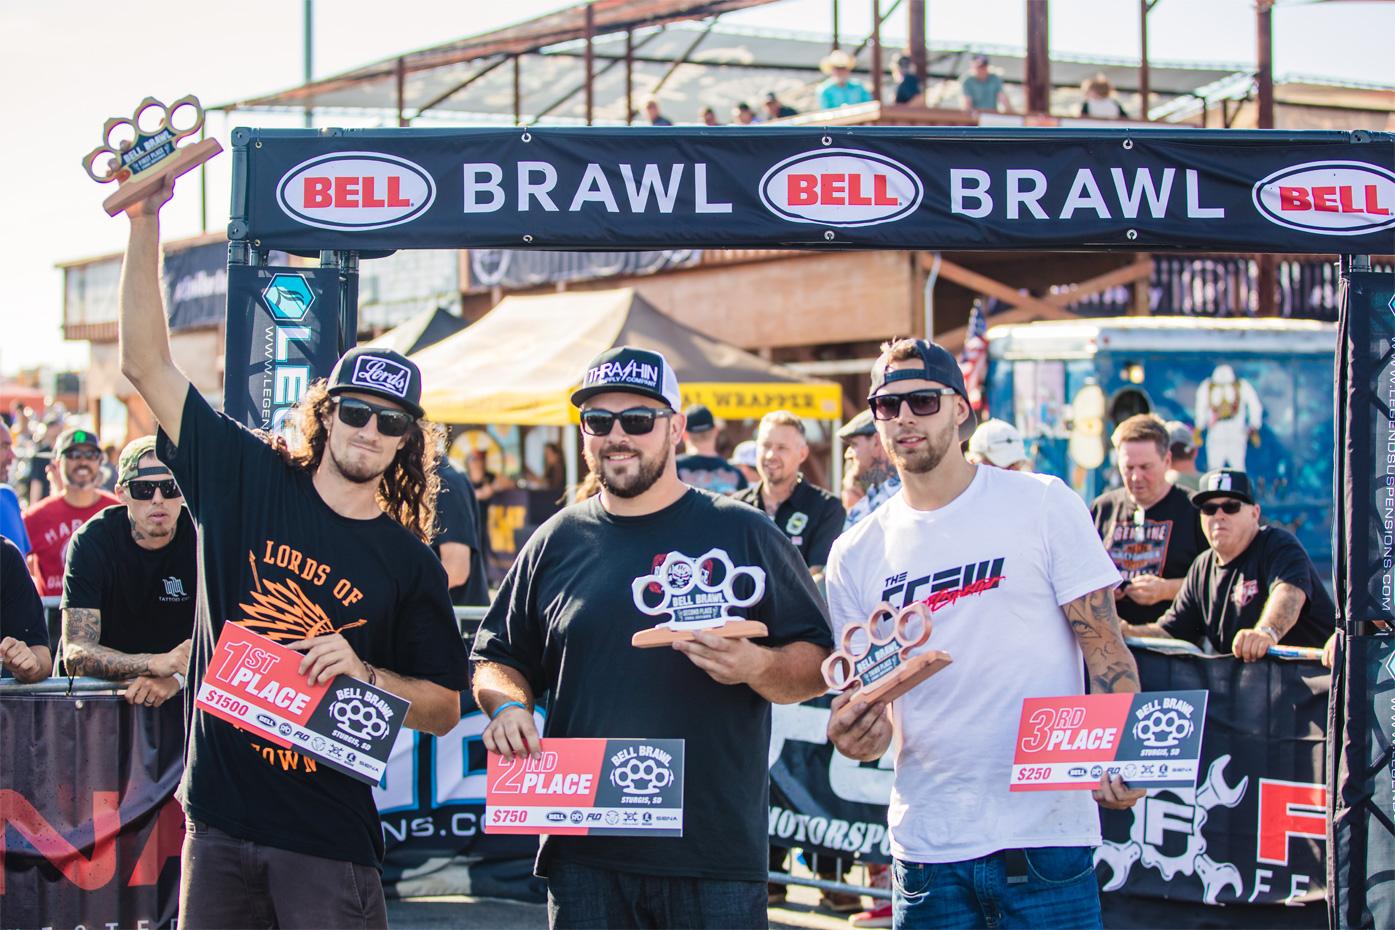 Bell Brawl Winners